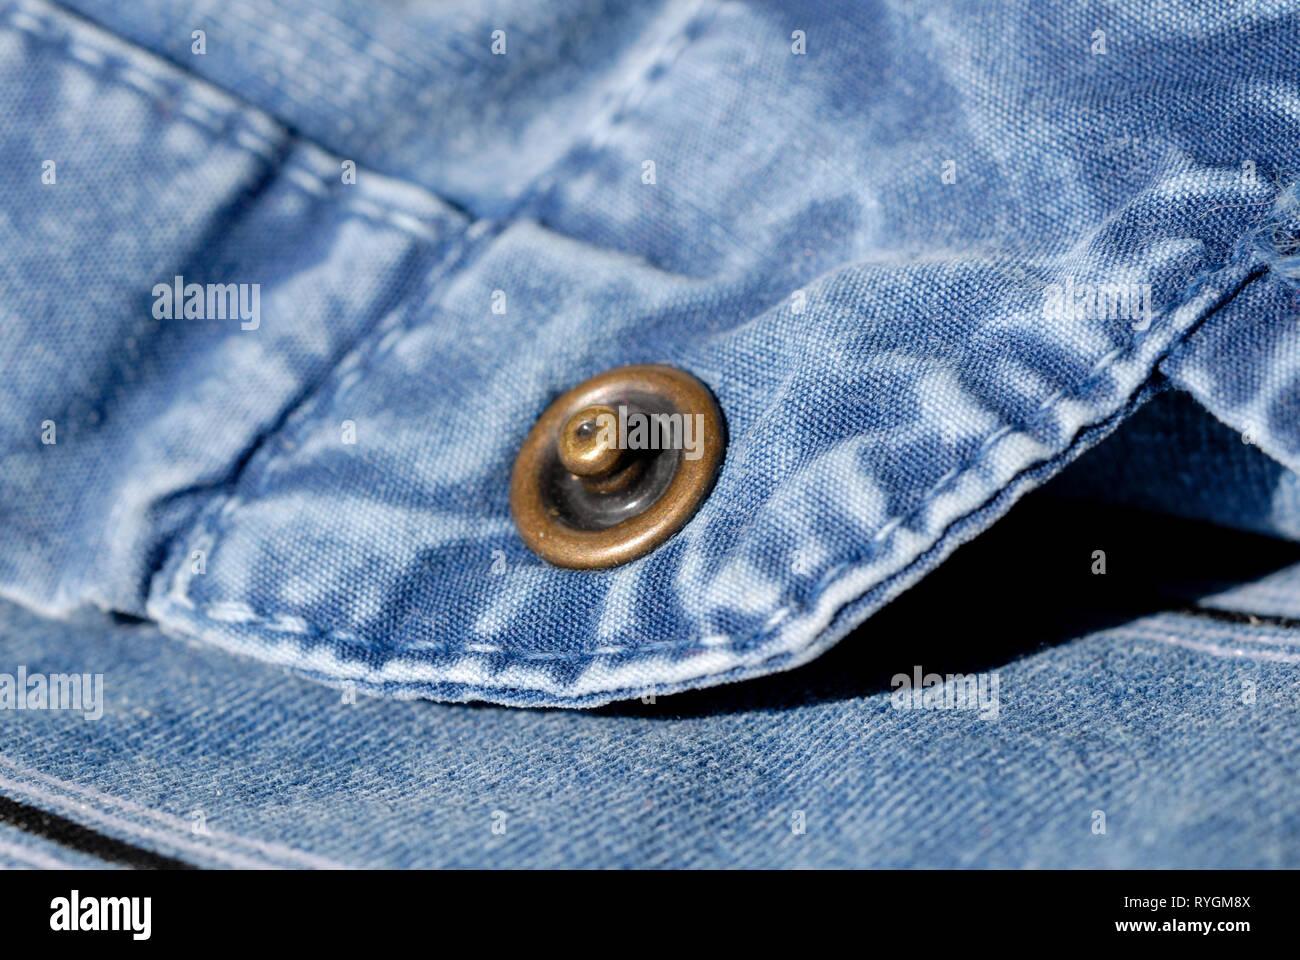 Button closure on a blue denim shirt closeup. Shallow depth of field - Stock Image